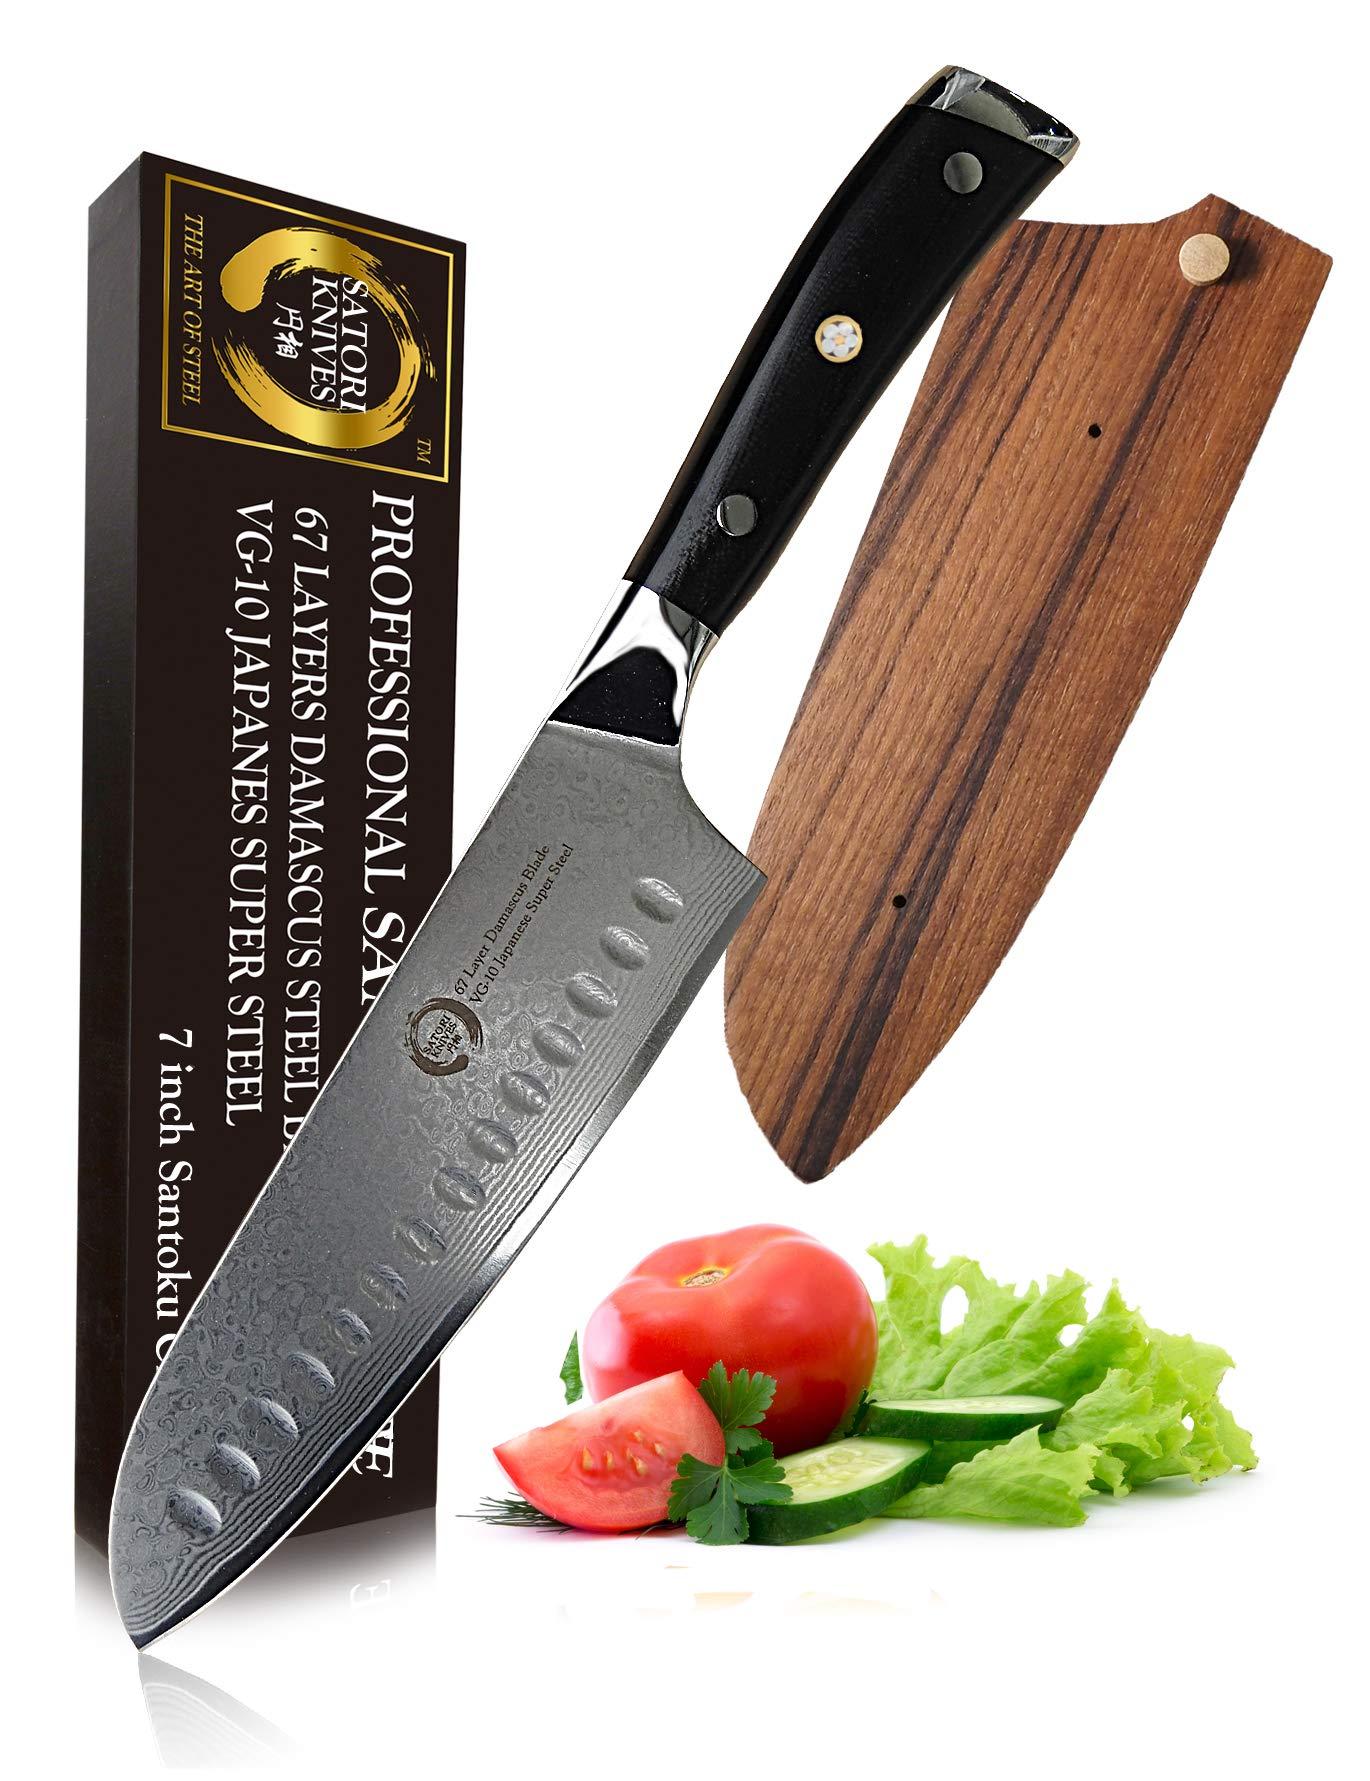 7'' Professional Santoku Chef's Knife By Koto Satori - 67 Layers Damascus Blade, Japanese VG-10 Super Steel Chef Knife, G10 Handle, Full Tang Custom Fit Teak Wood Knife Sheath, Gift Packaging.